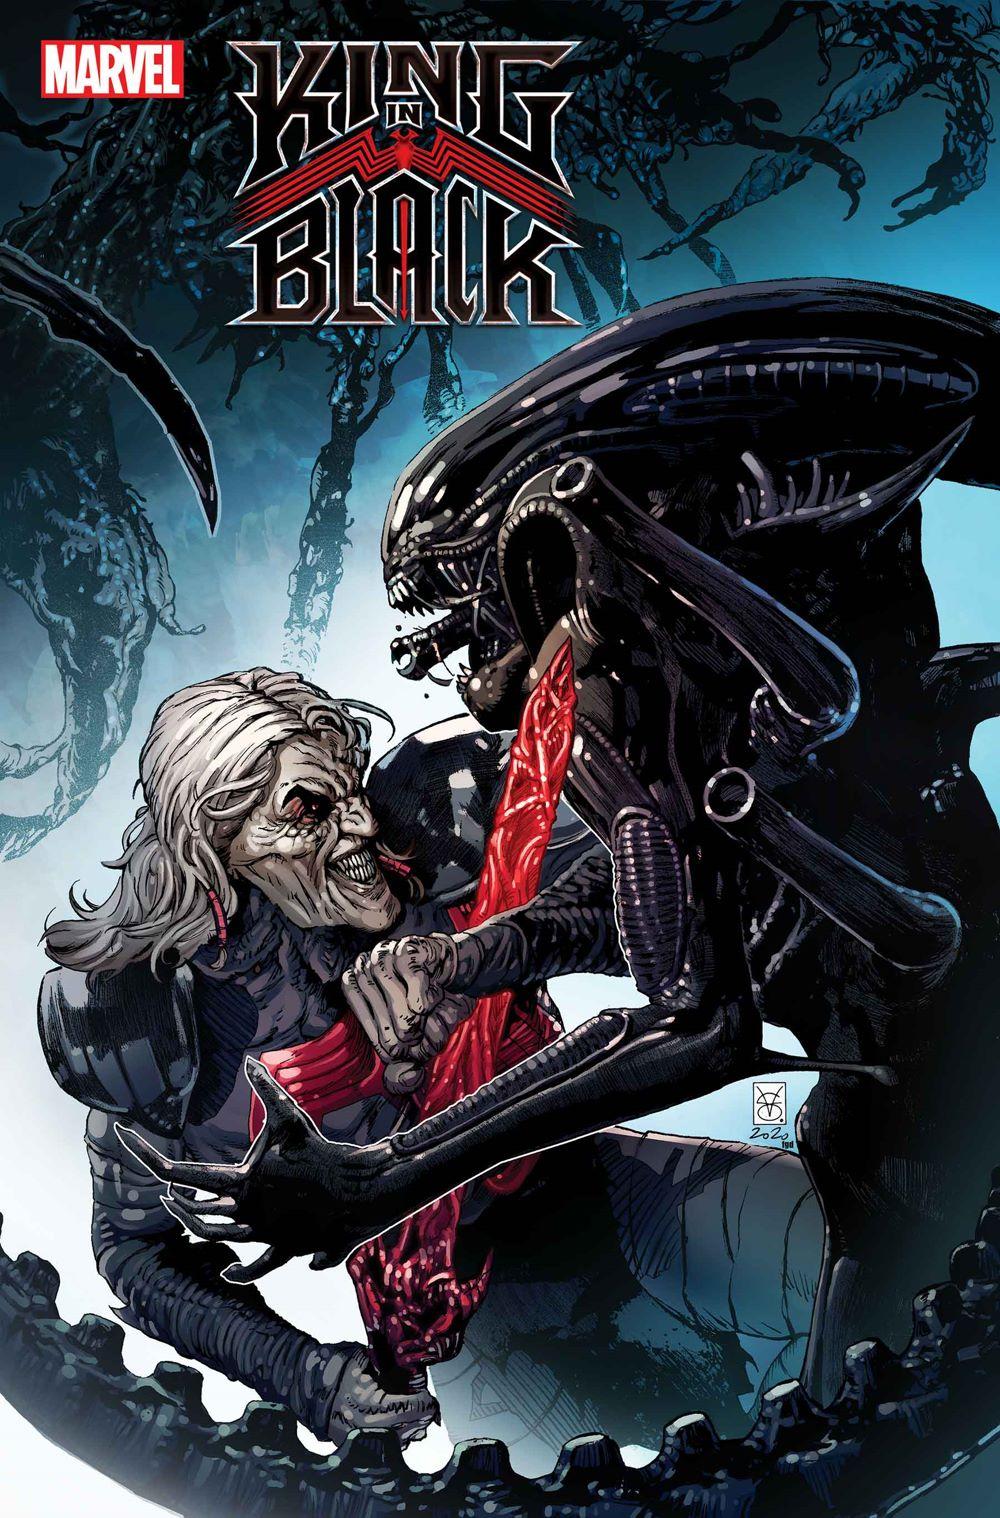 KINGINBLACK003_GiangiordanoVar-1 Marvel Comics January 2021 Solicitations